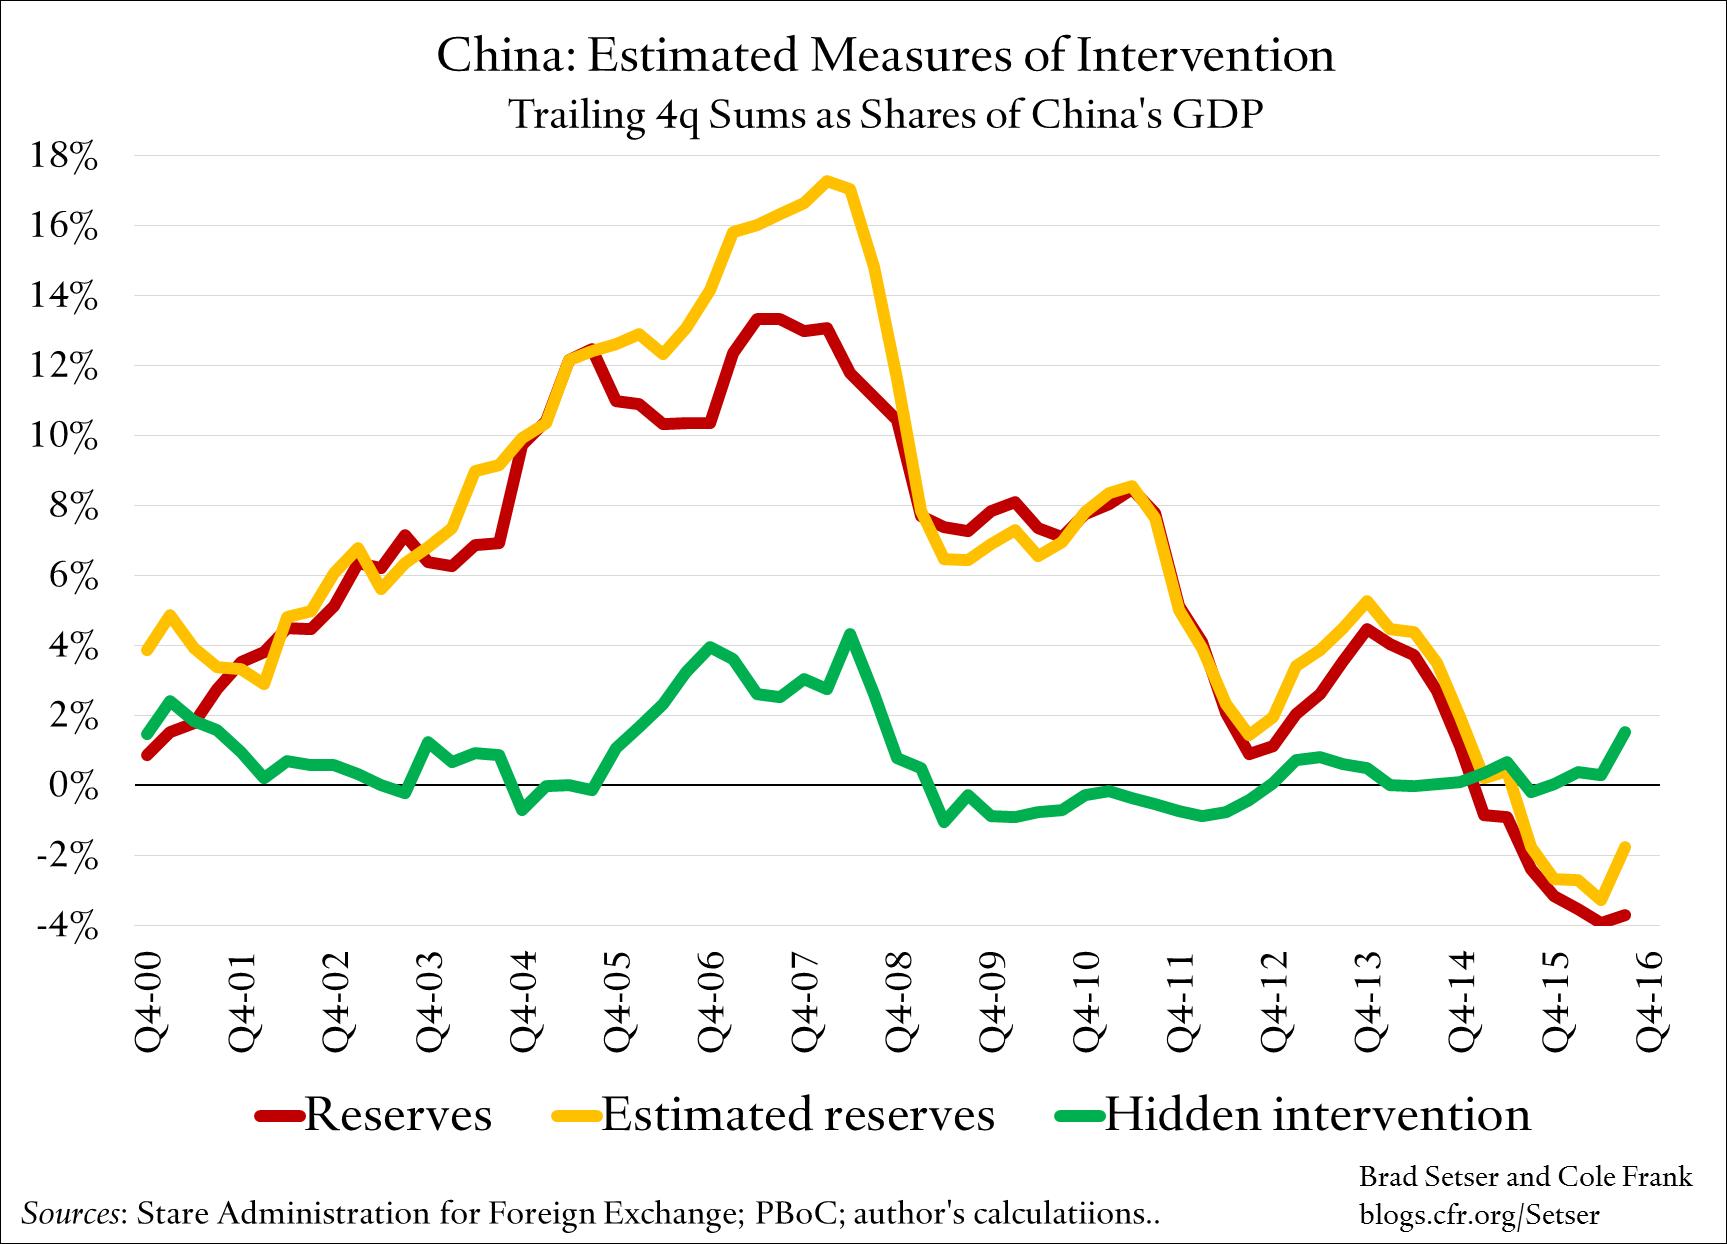 china-estimated-intervention-gdp-share